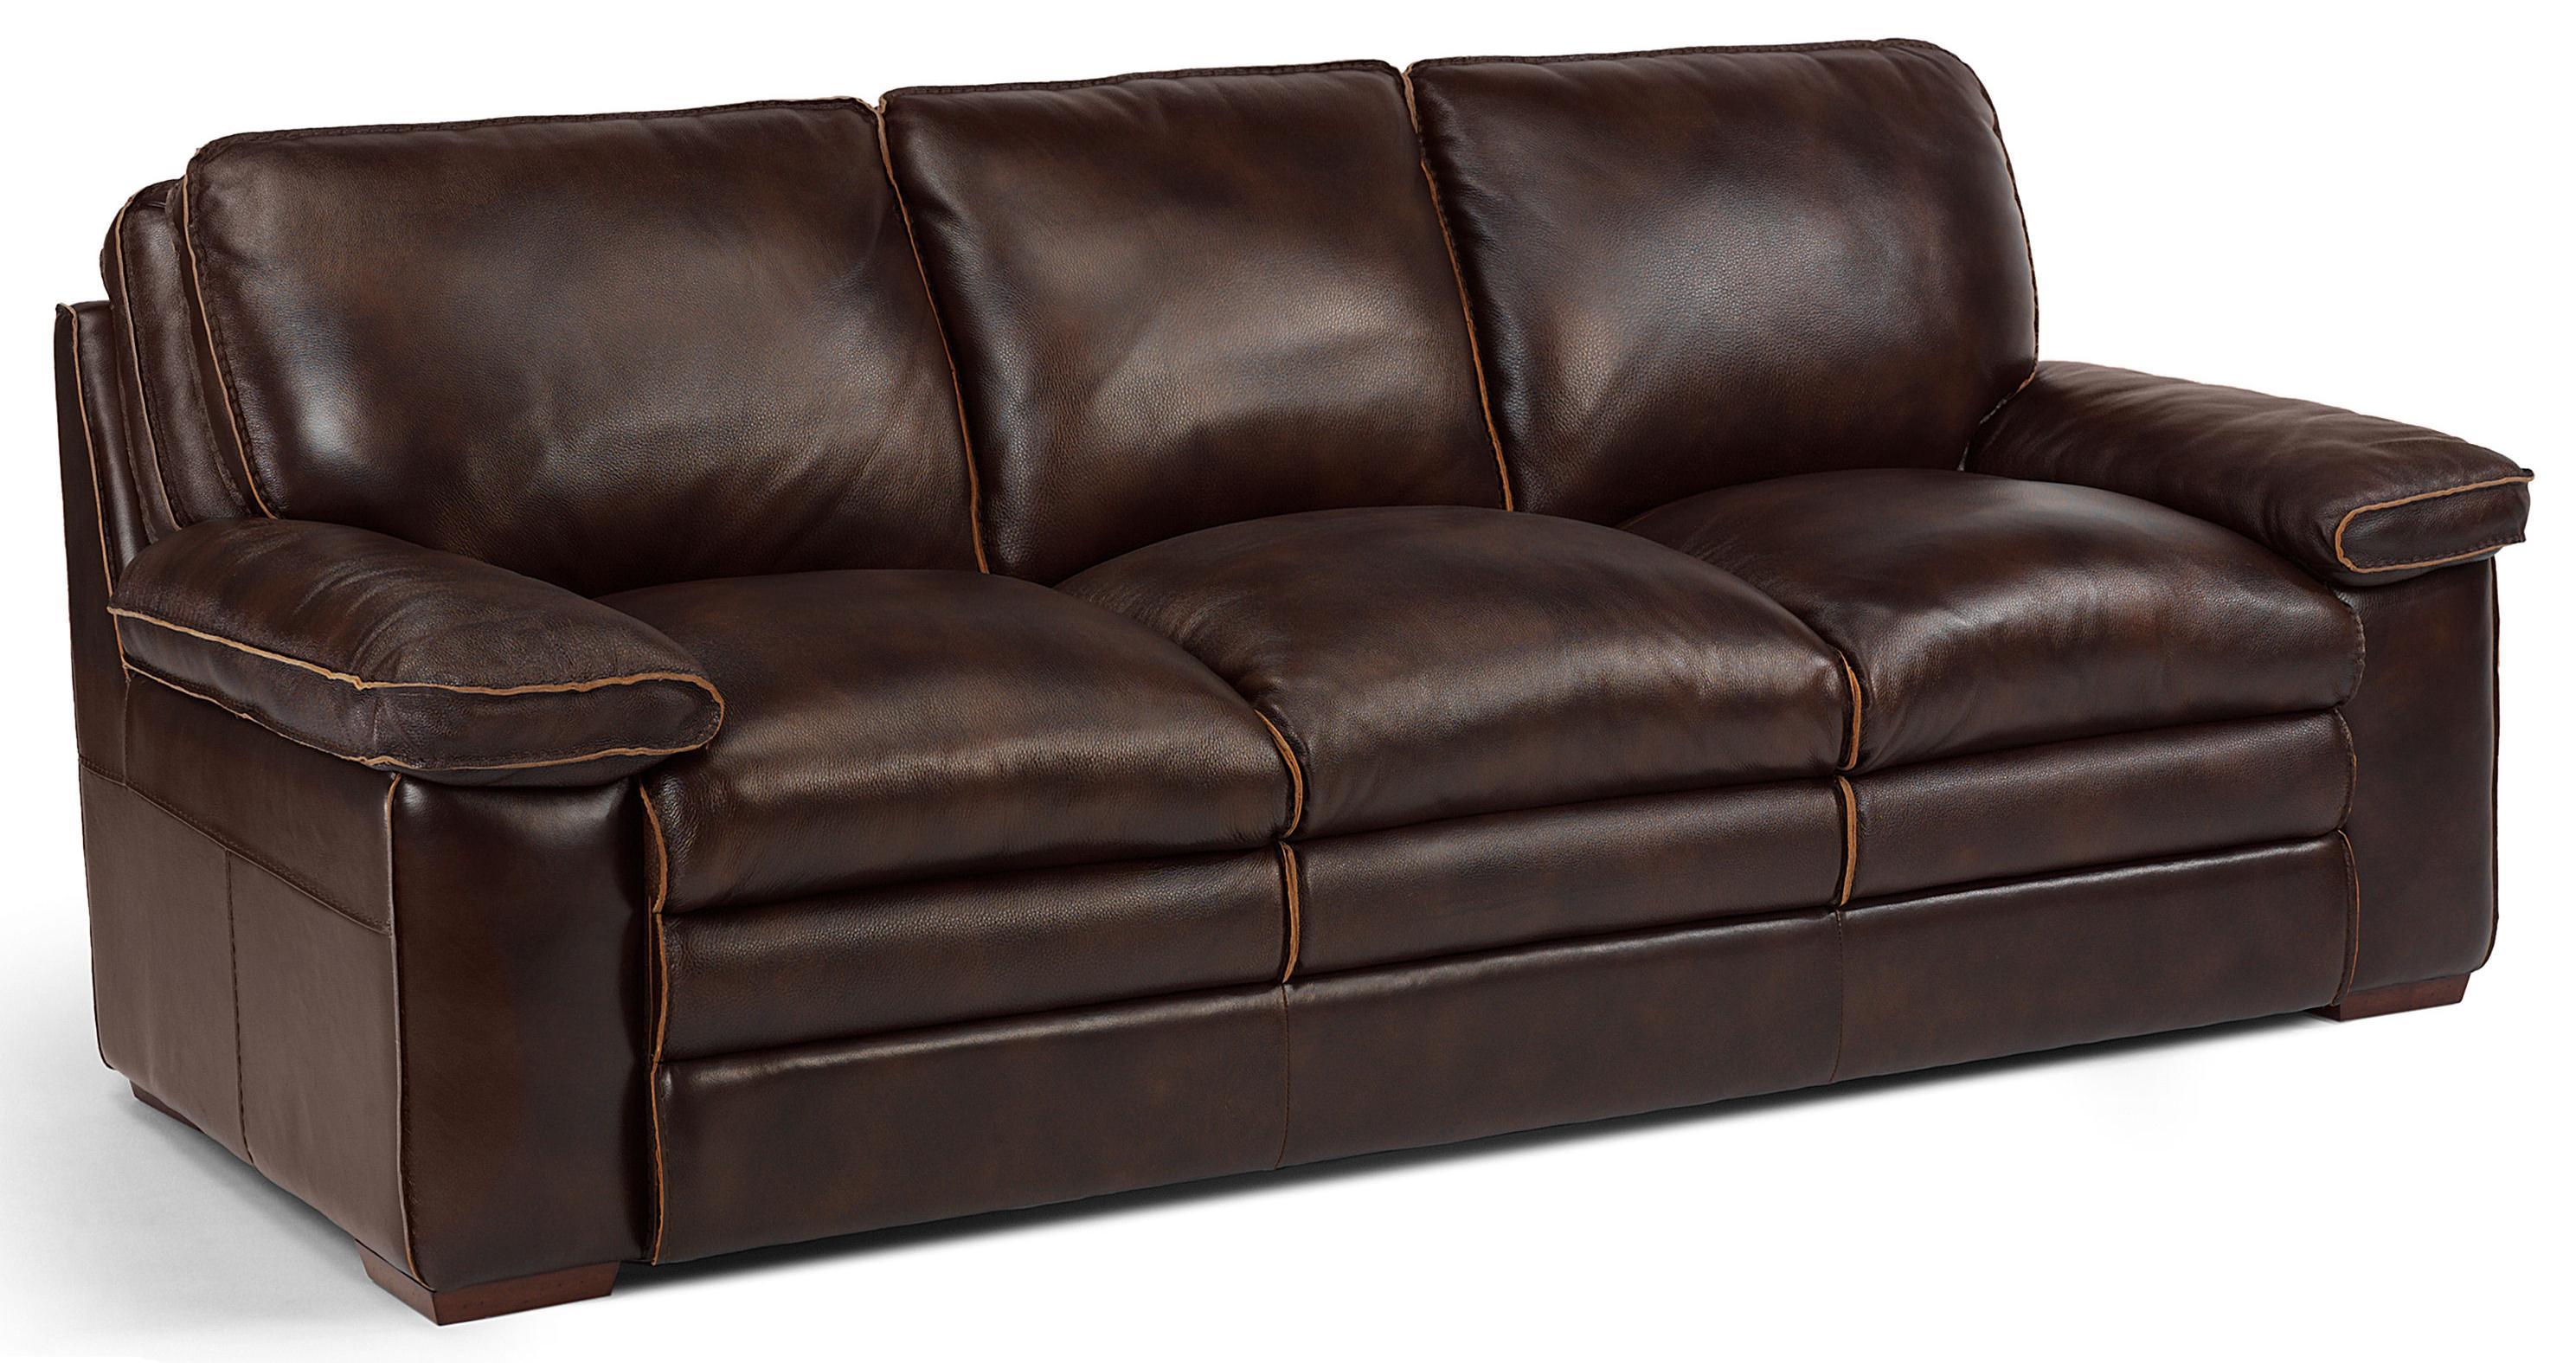 flexsteel bexley sofa and loveseat sale harrison 7271 31 upholstered